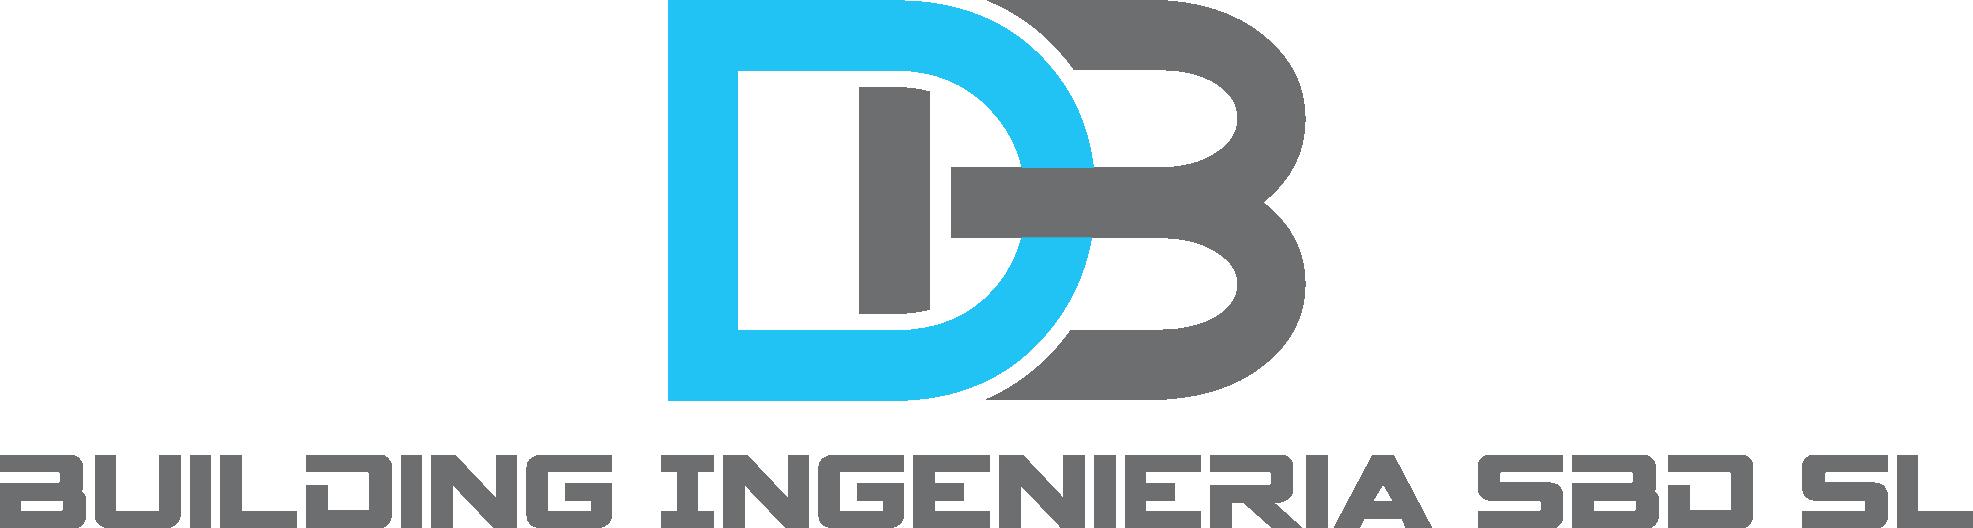 Building Ingenieria Sbd Sl